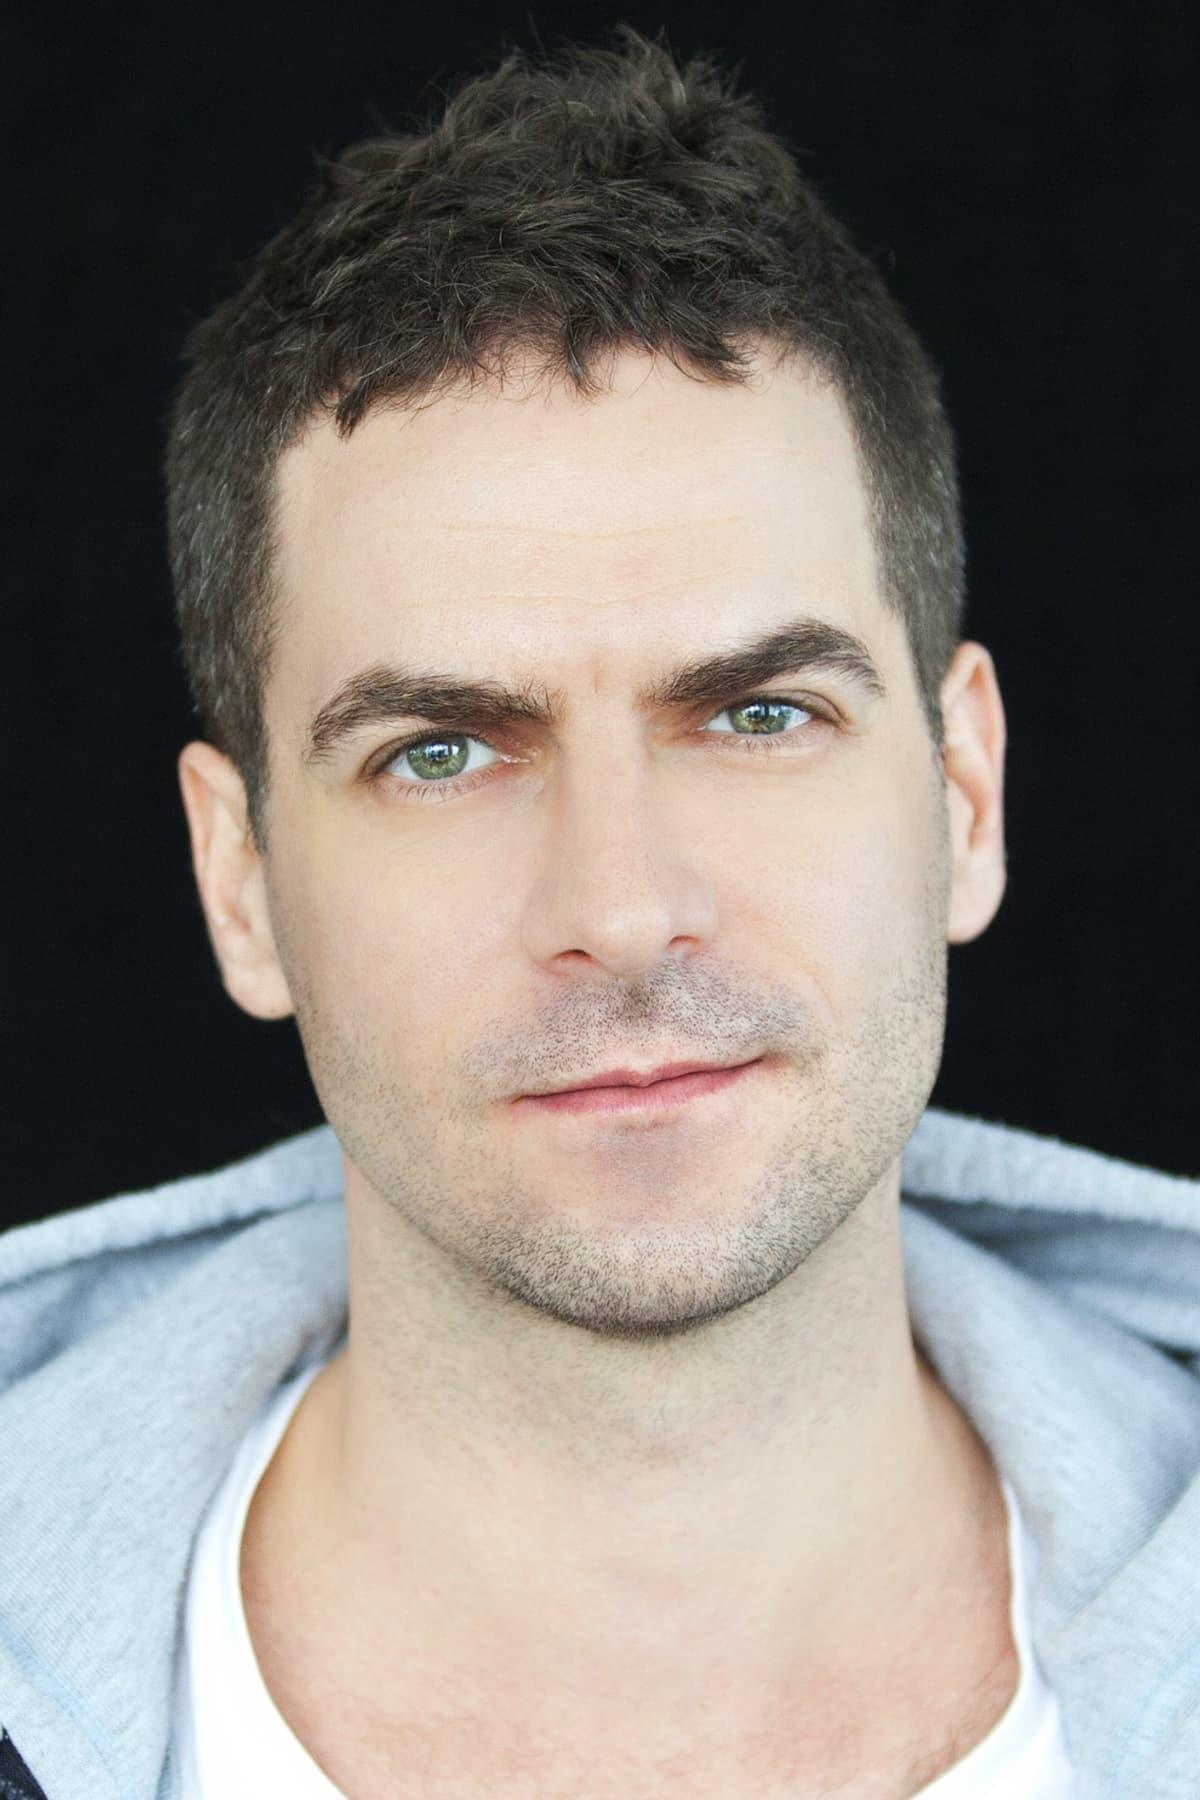 Tomas Chovanec